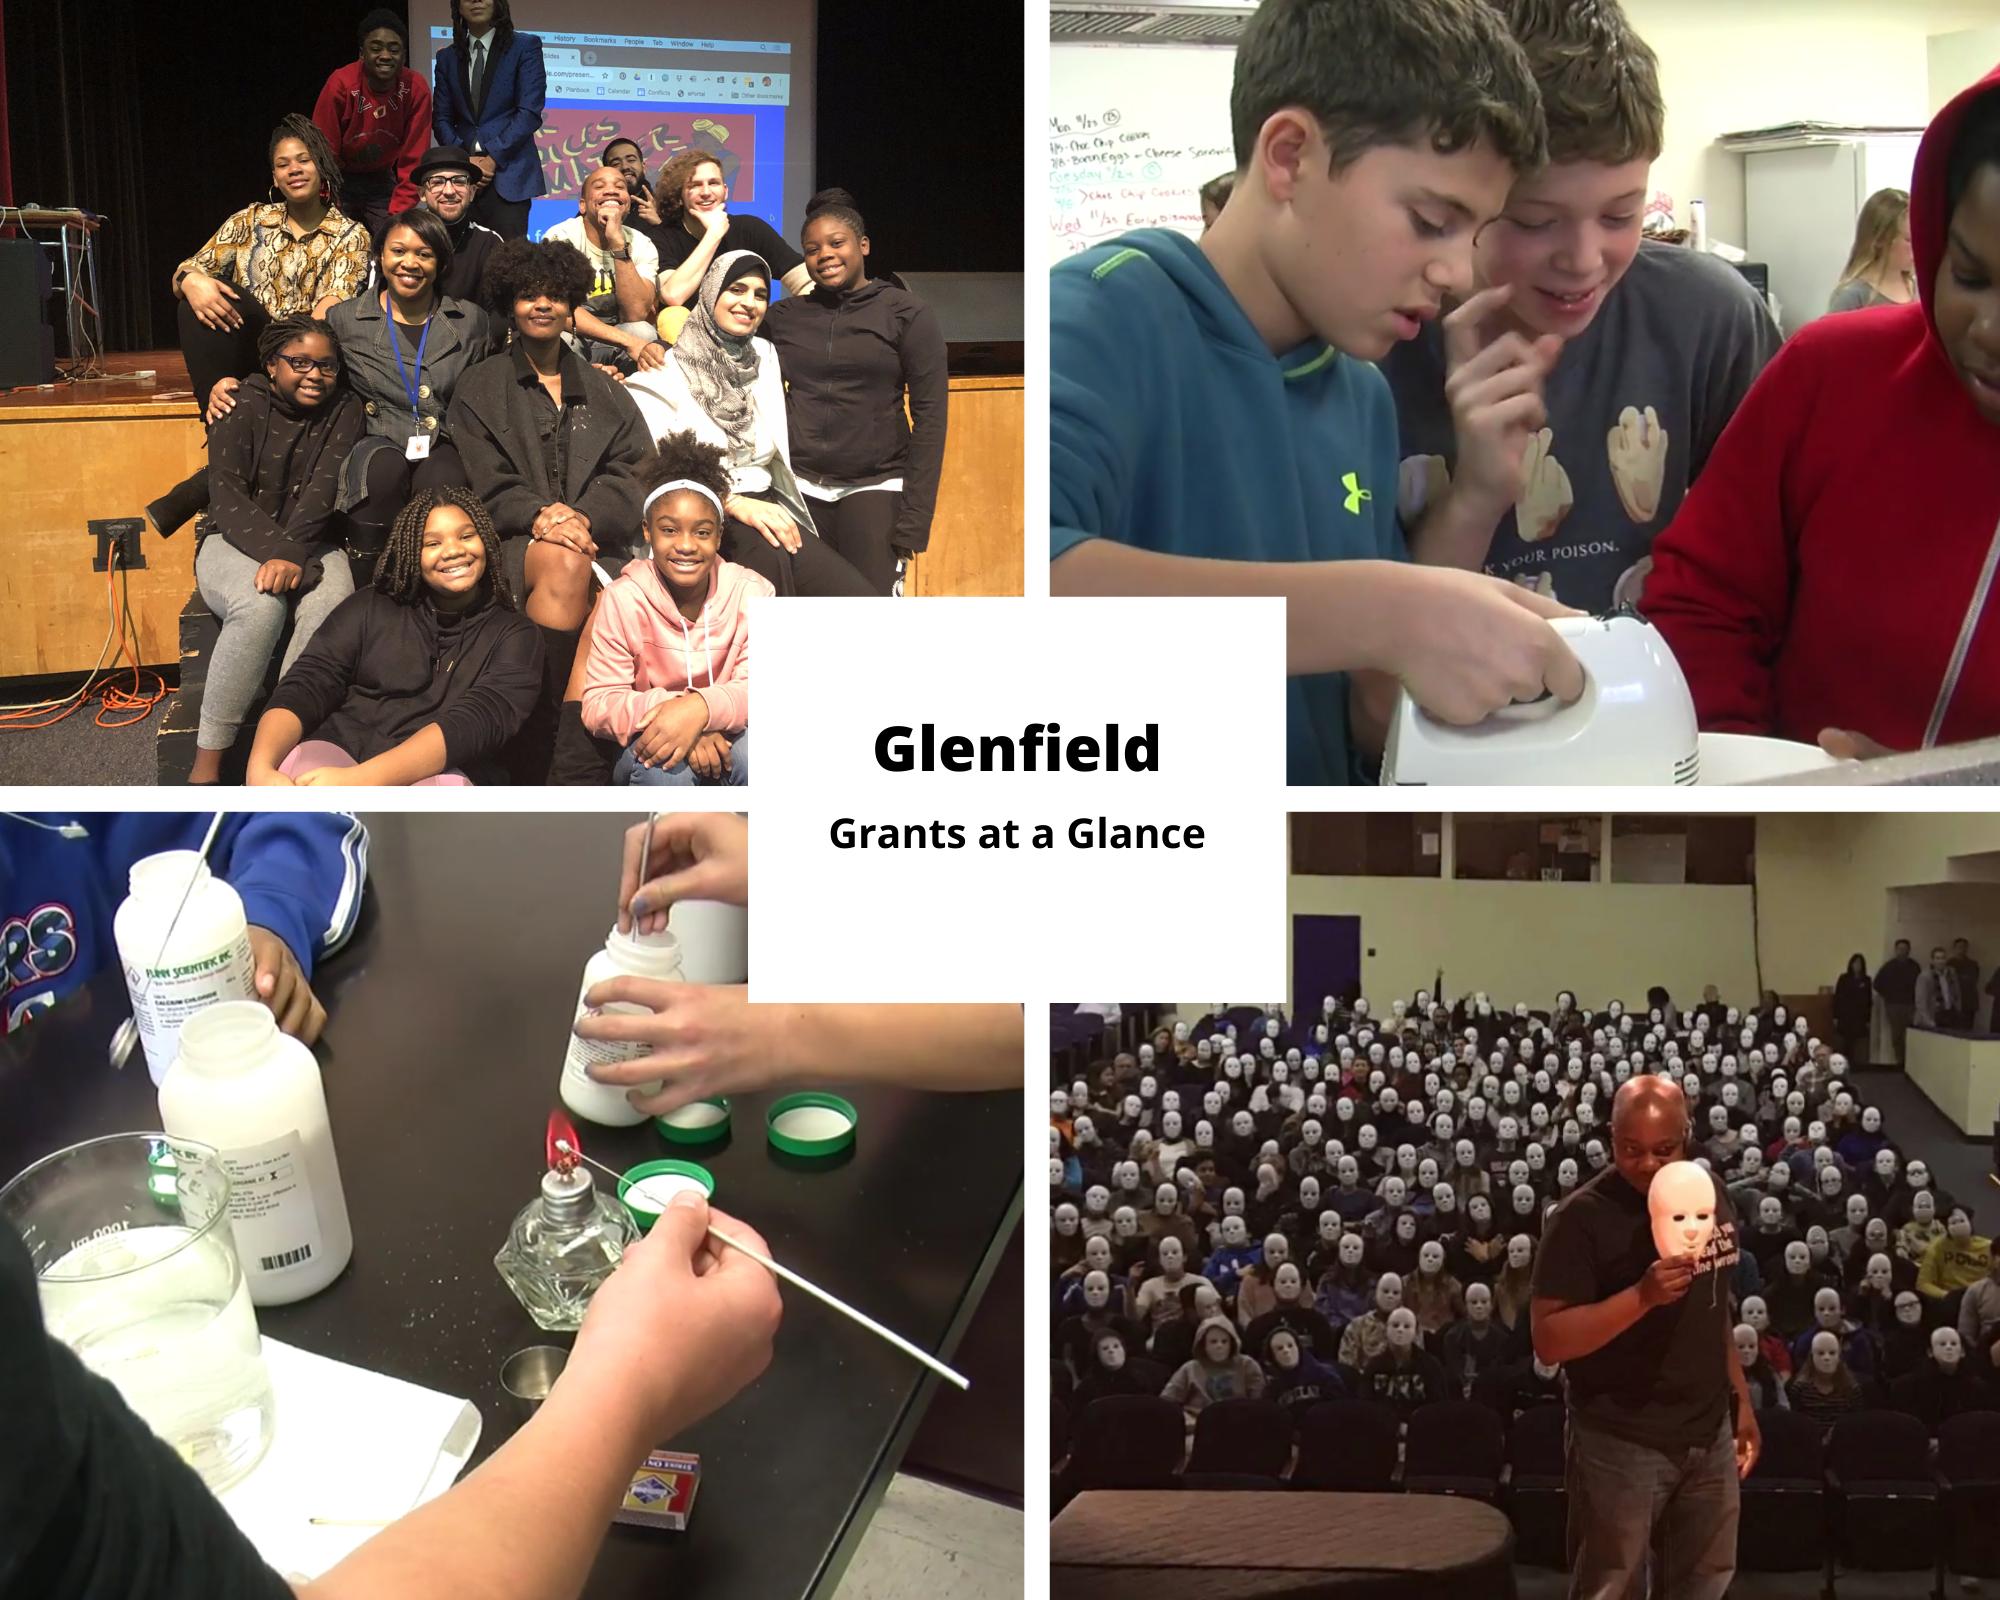 Glenfield Middle School